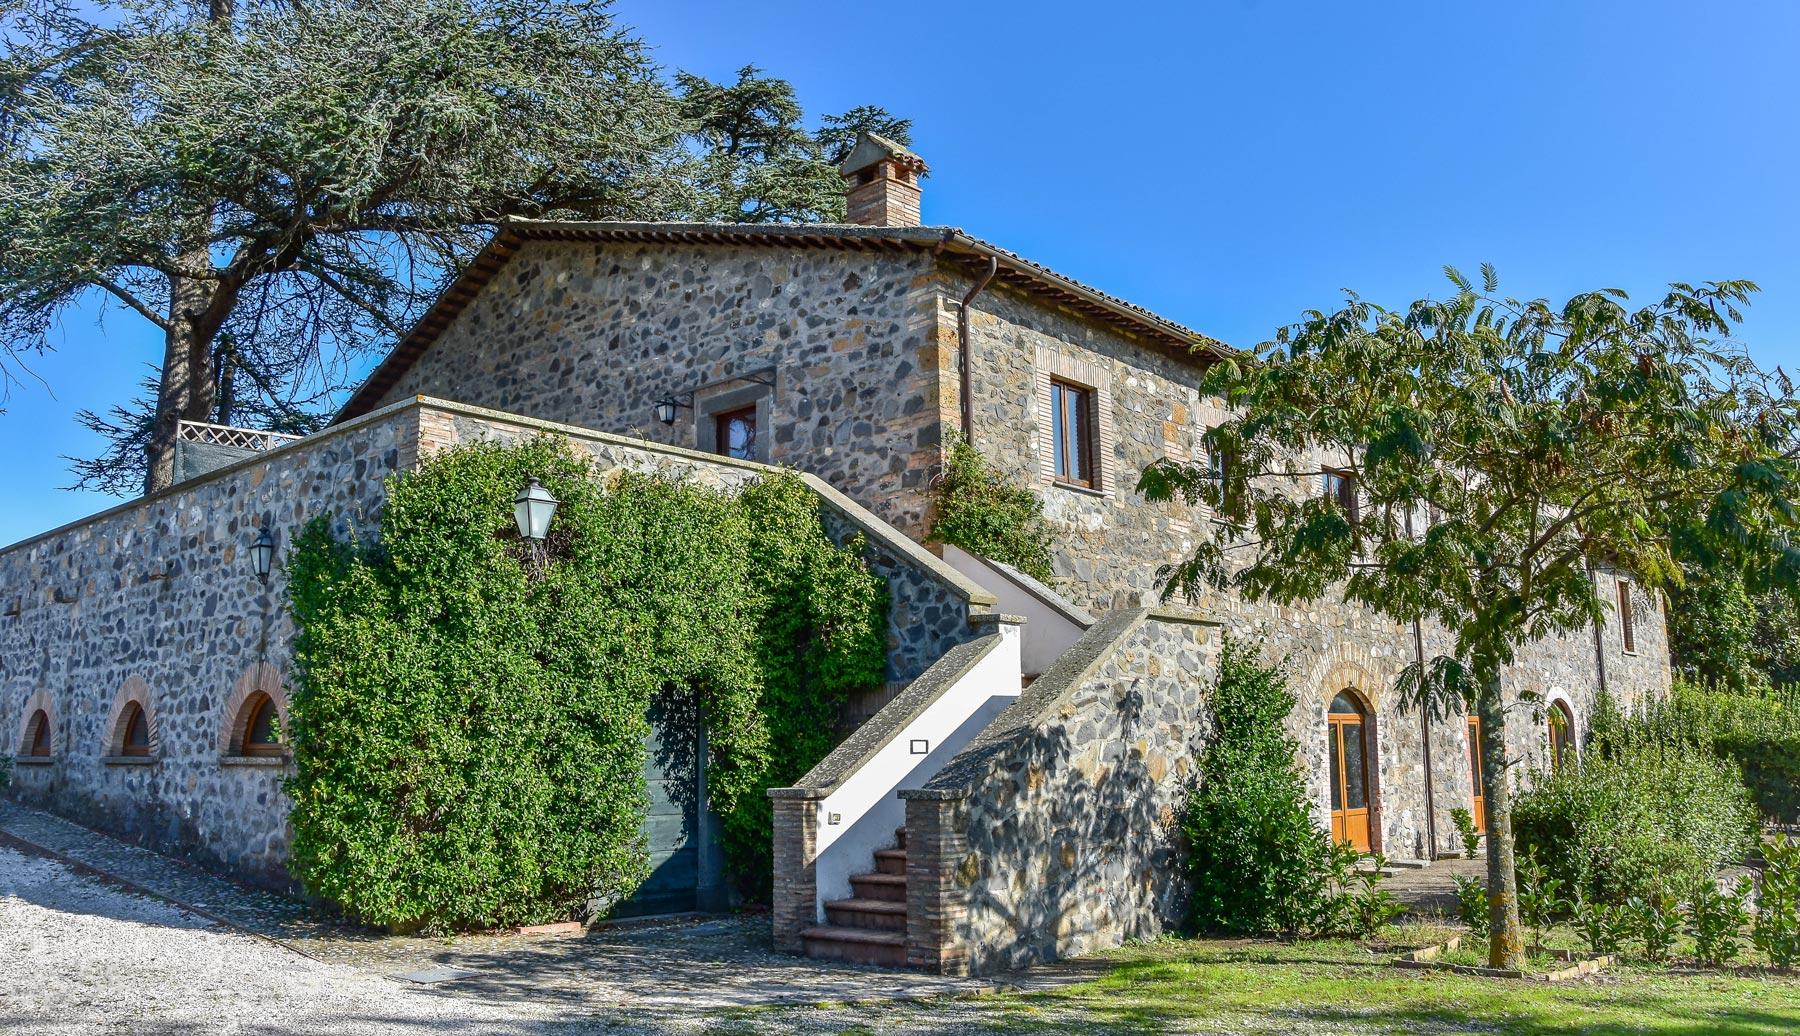 Agriturismo-Villa Monteporzano-Orvieto-Umbria